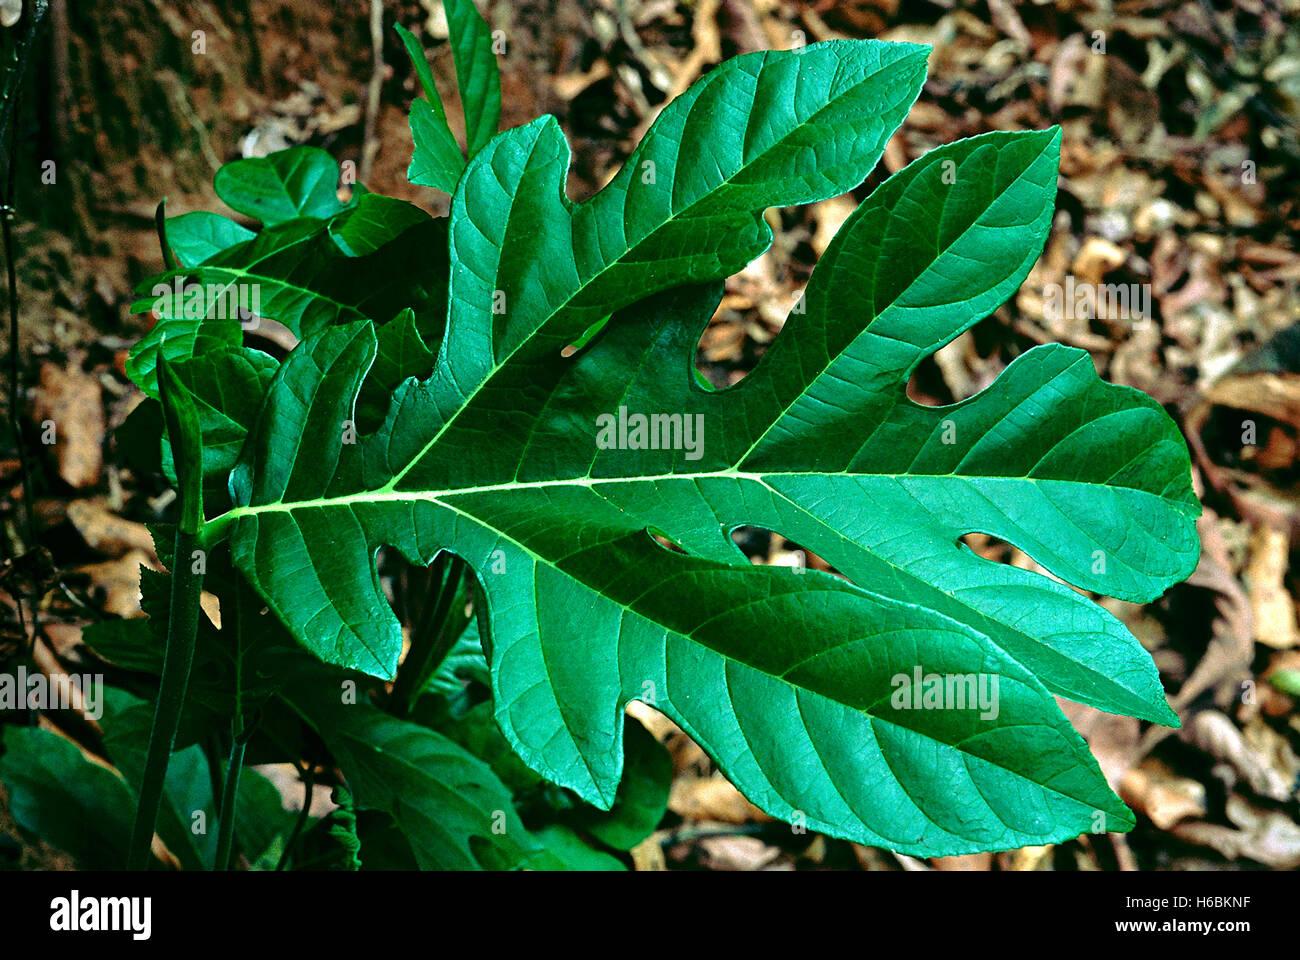 Blatt. artocarpus sp. Familie: moraceae. Eine Art Wild Jack - Obst Baum. Die Blätter der Setzlinge groß Stockbild